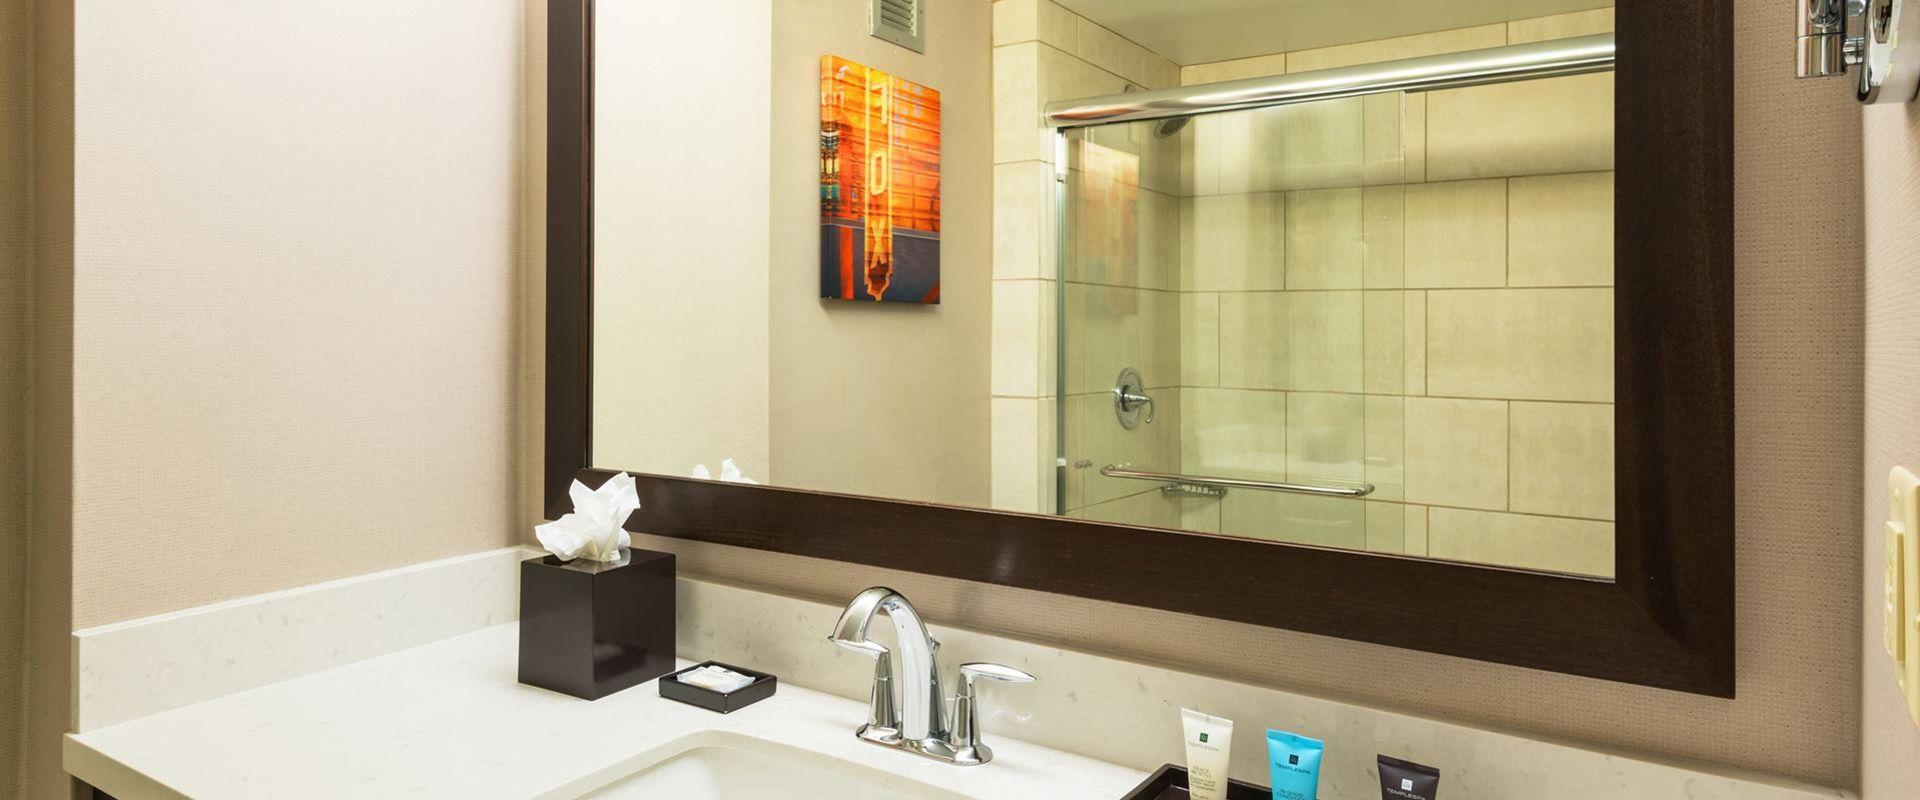 Atlanta Hotel Guest Bathroom Vanity